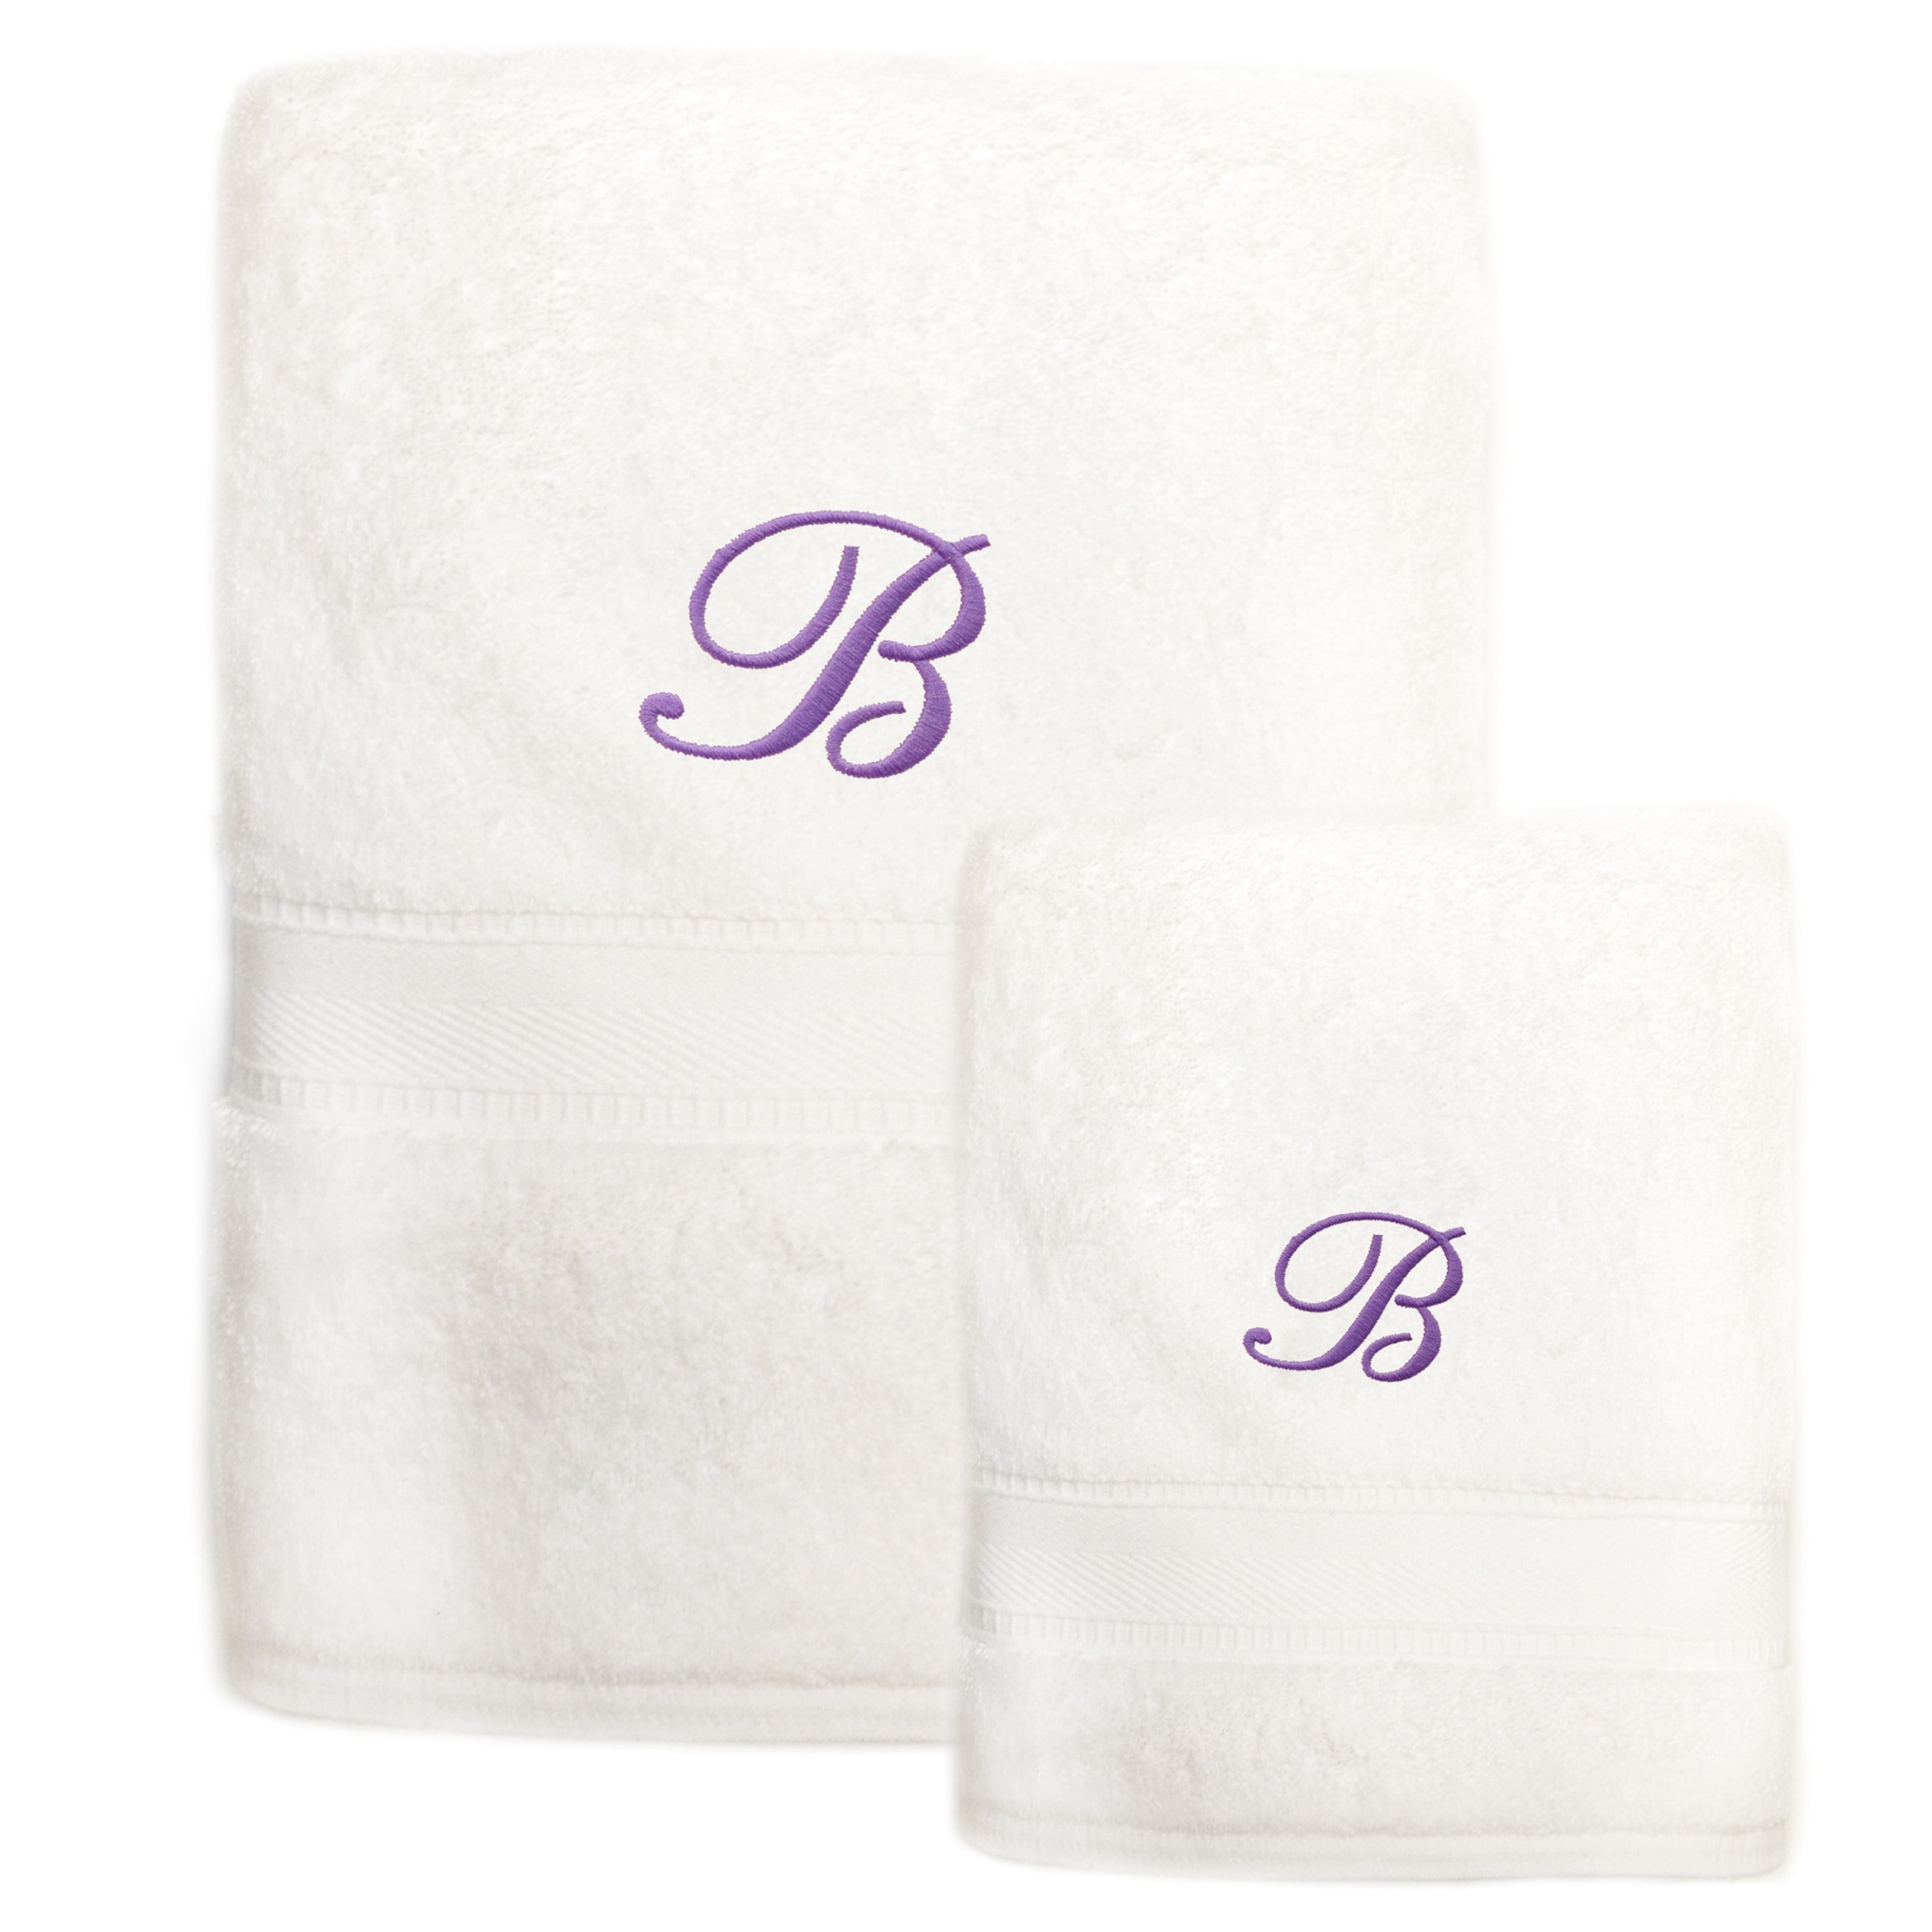 Sweet Kids 2-piece White Turkish Cotton Bath and Hand Towel Set with ...